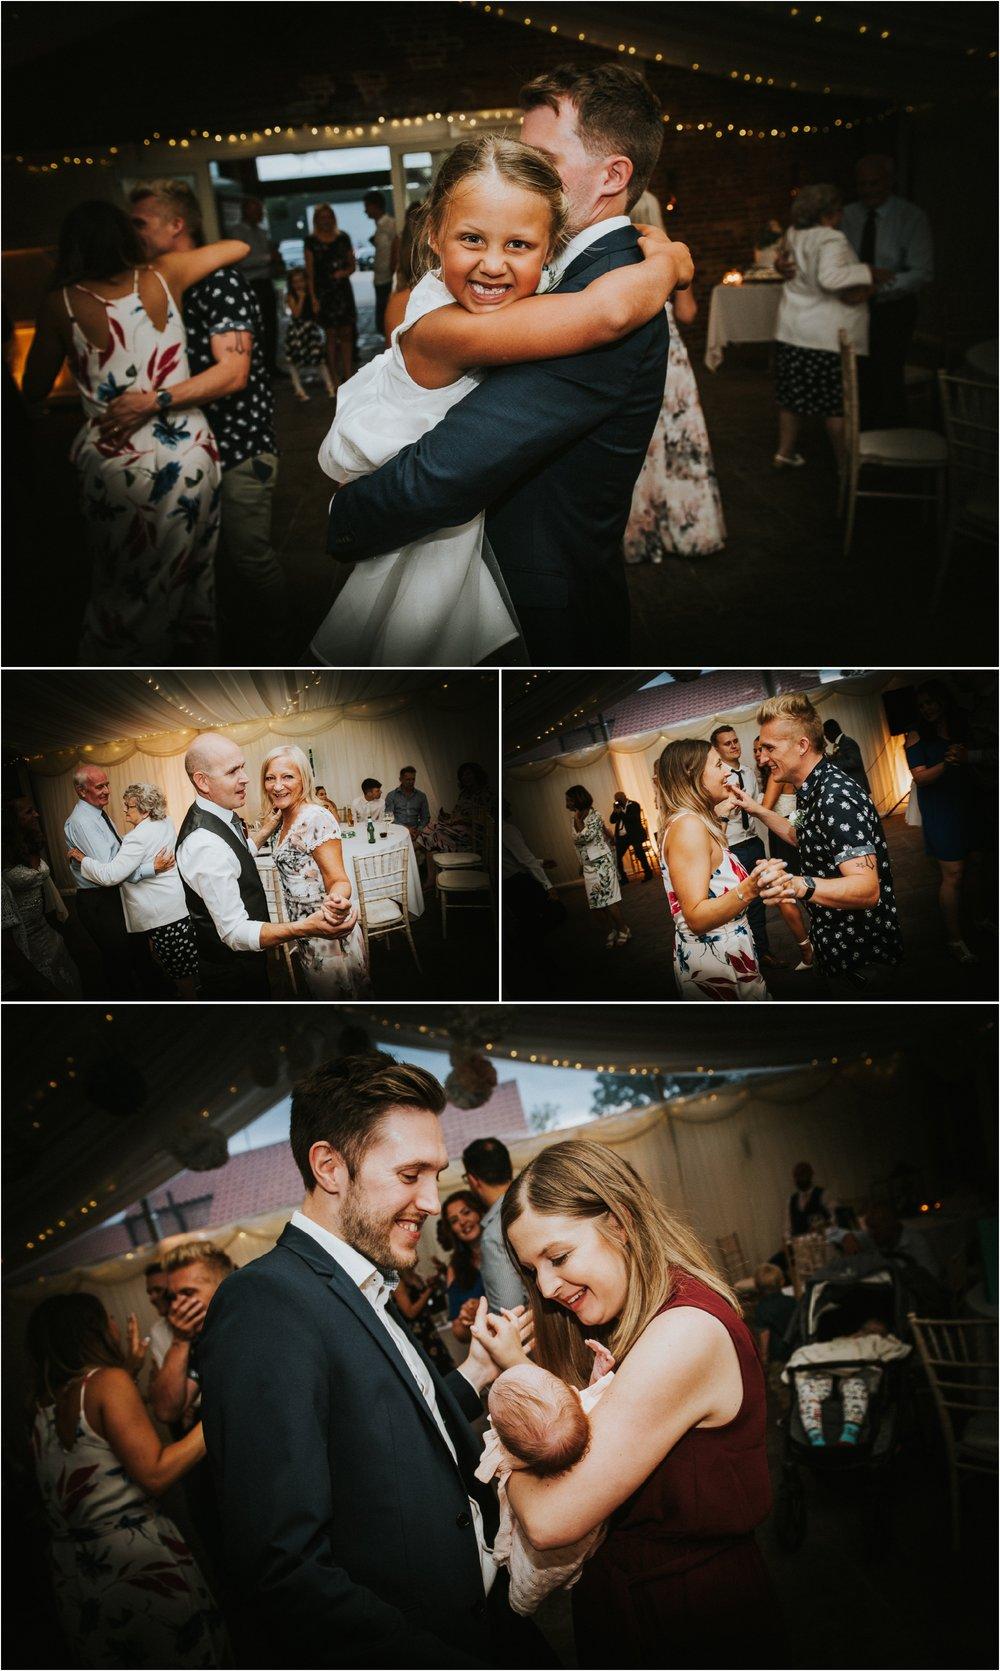 PheasantBrewery-LukeHolroyd-Yorkshirewedding_000209.jpg